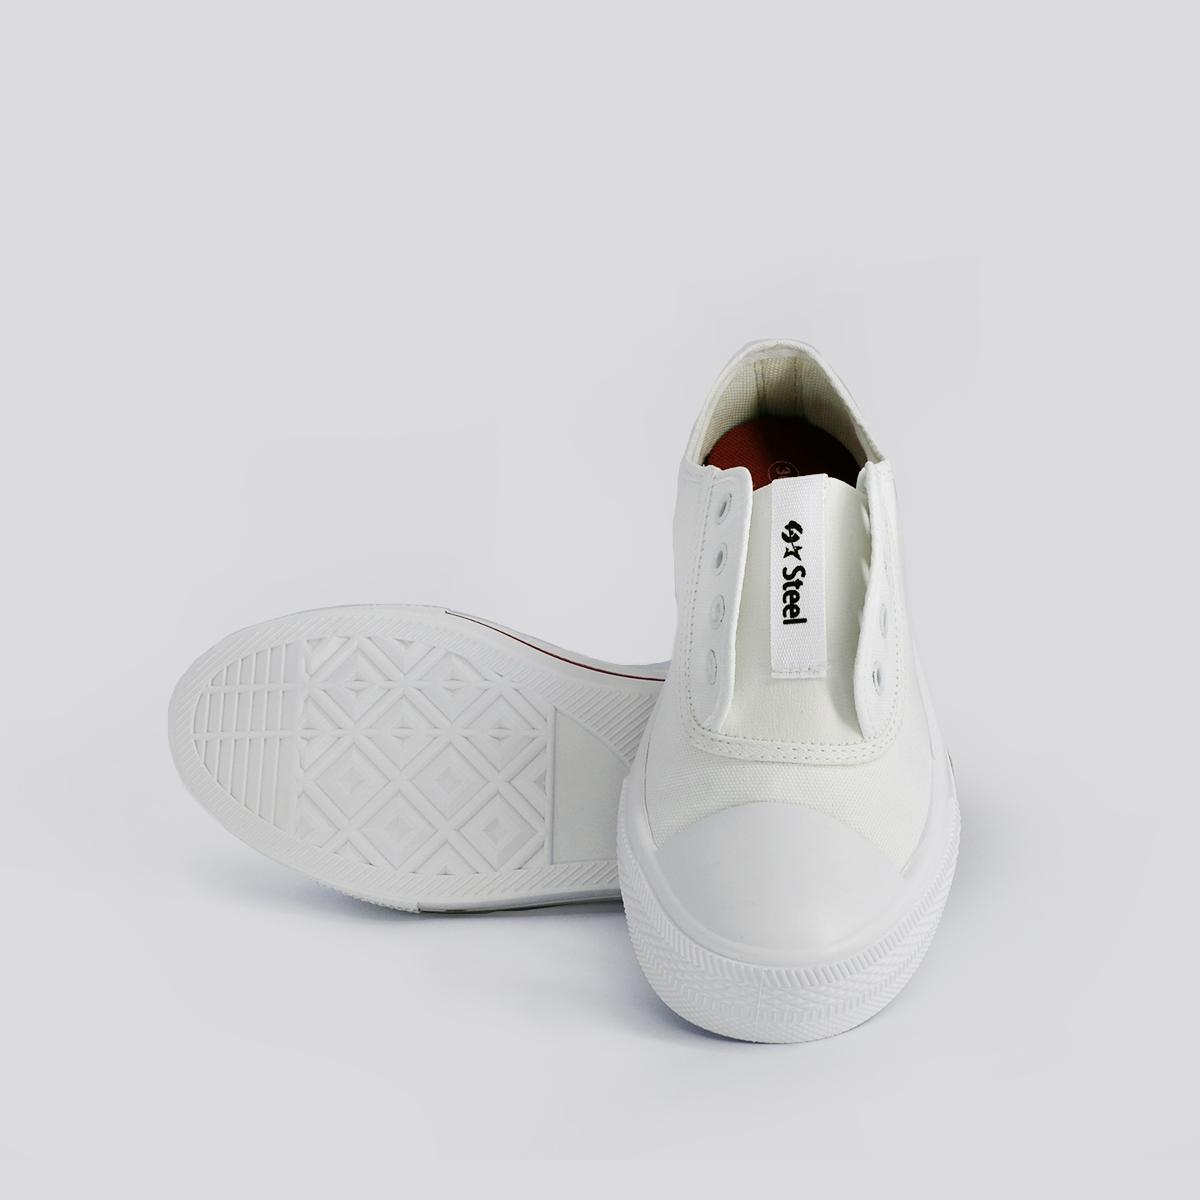 Tênis Feminino Casual com Elástico Steel Branco